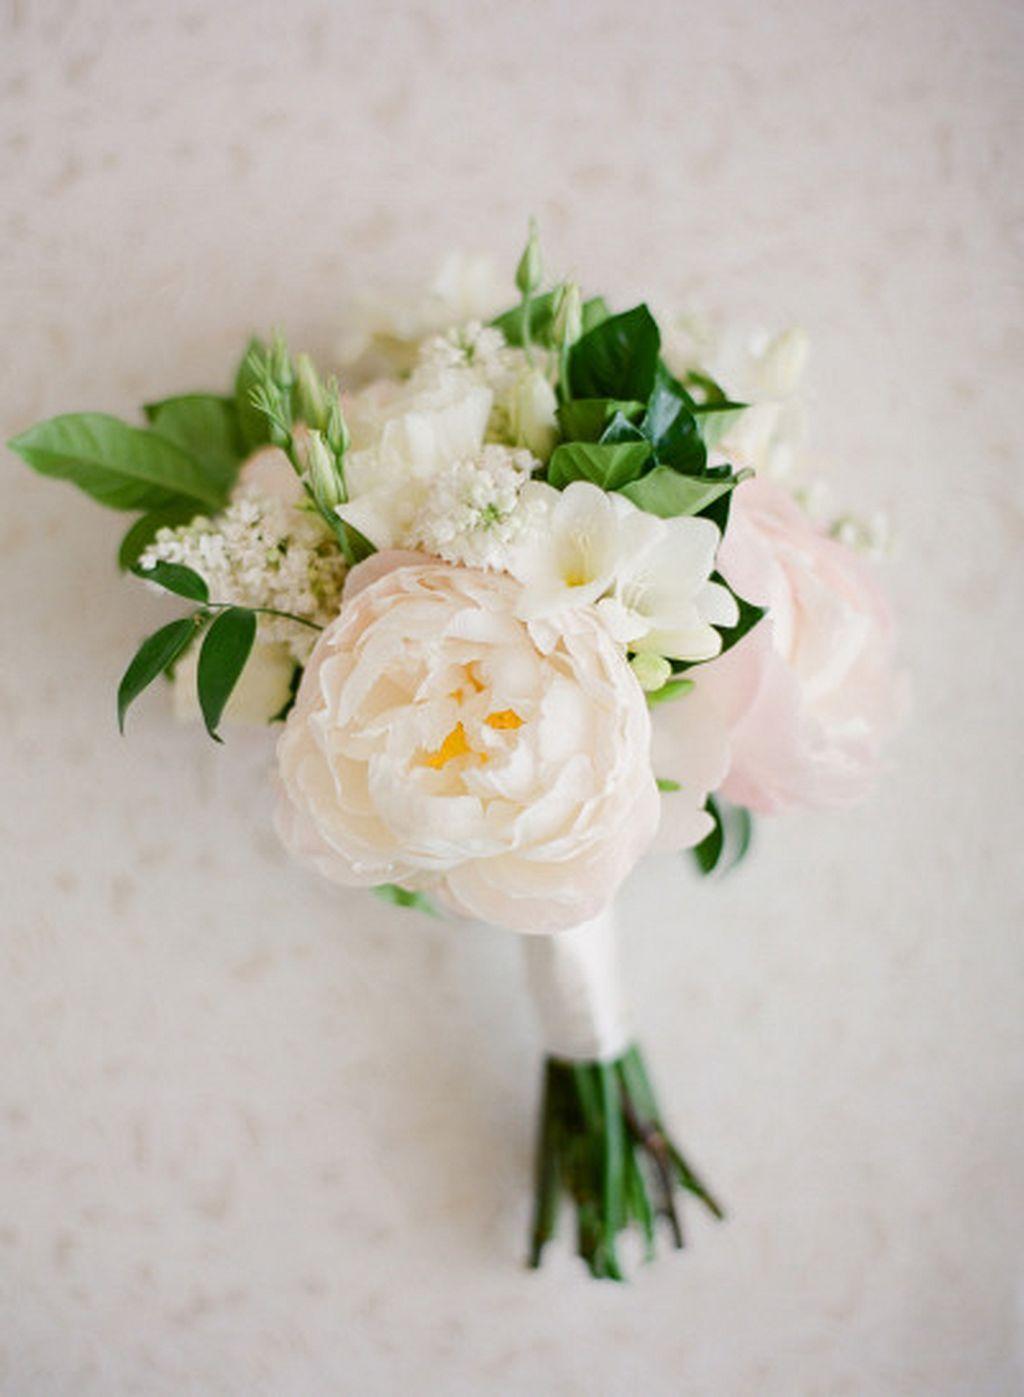 70+ Beautiful Bridesmaid Bouquet Ideas | Bridesmaid bouquets ...